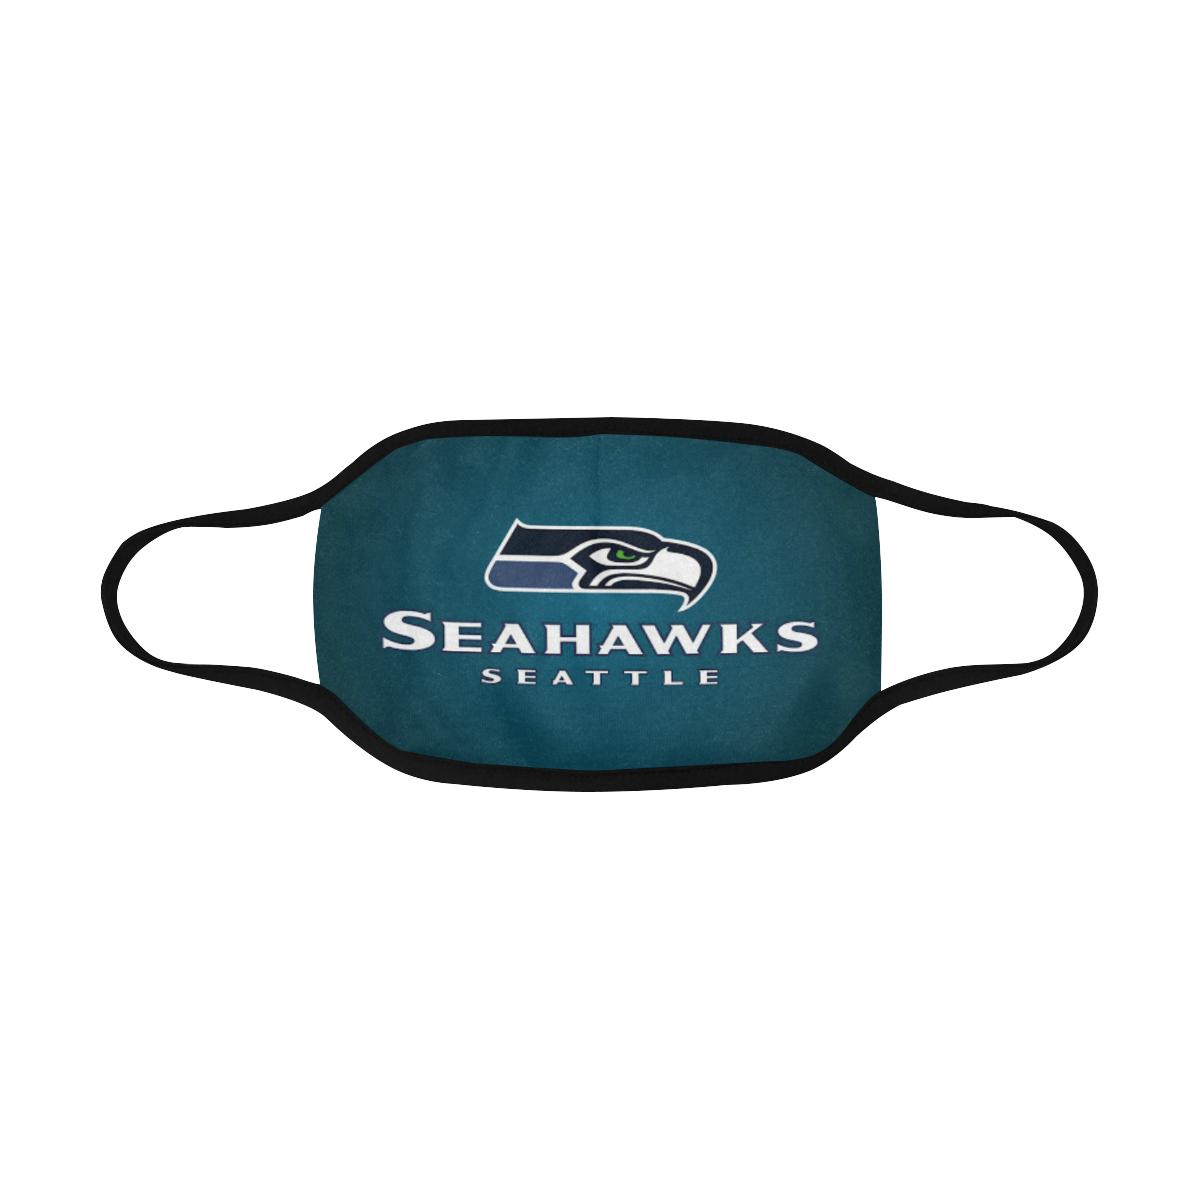 Seattle Seahawks Face Mask 2020 - Adults Mask PM2.5